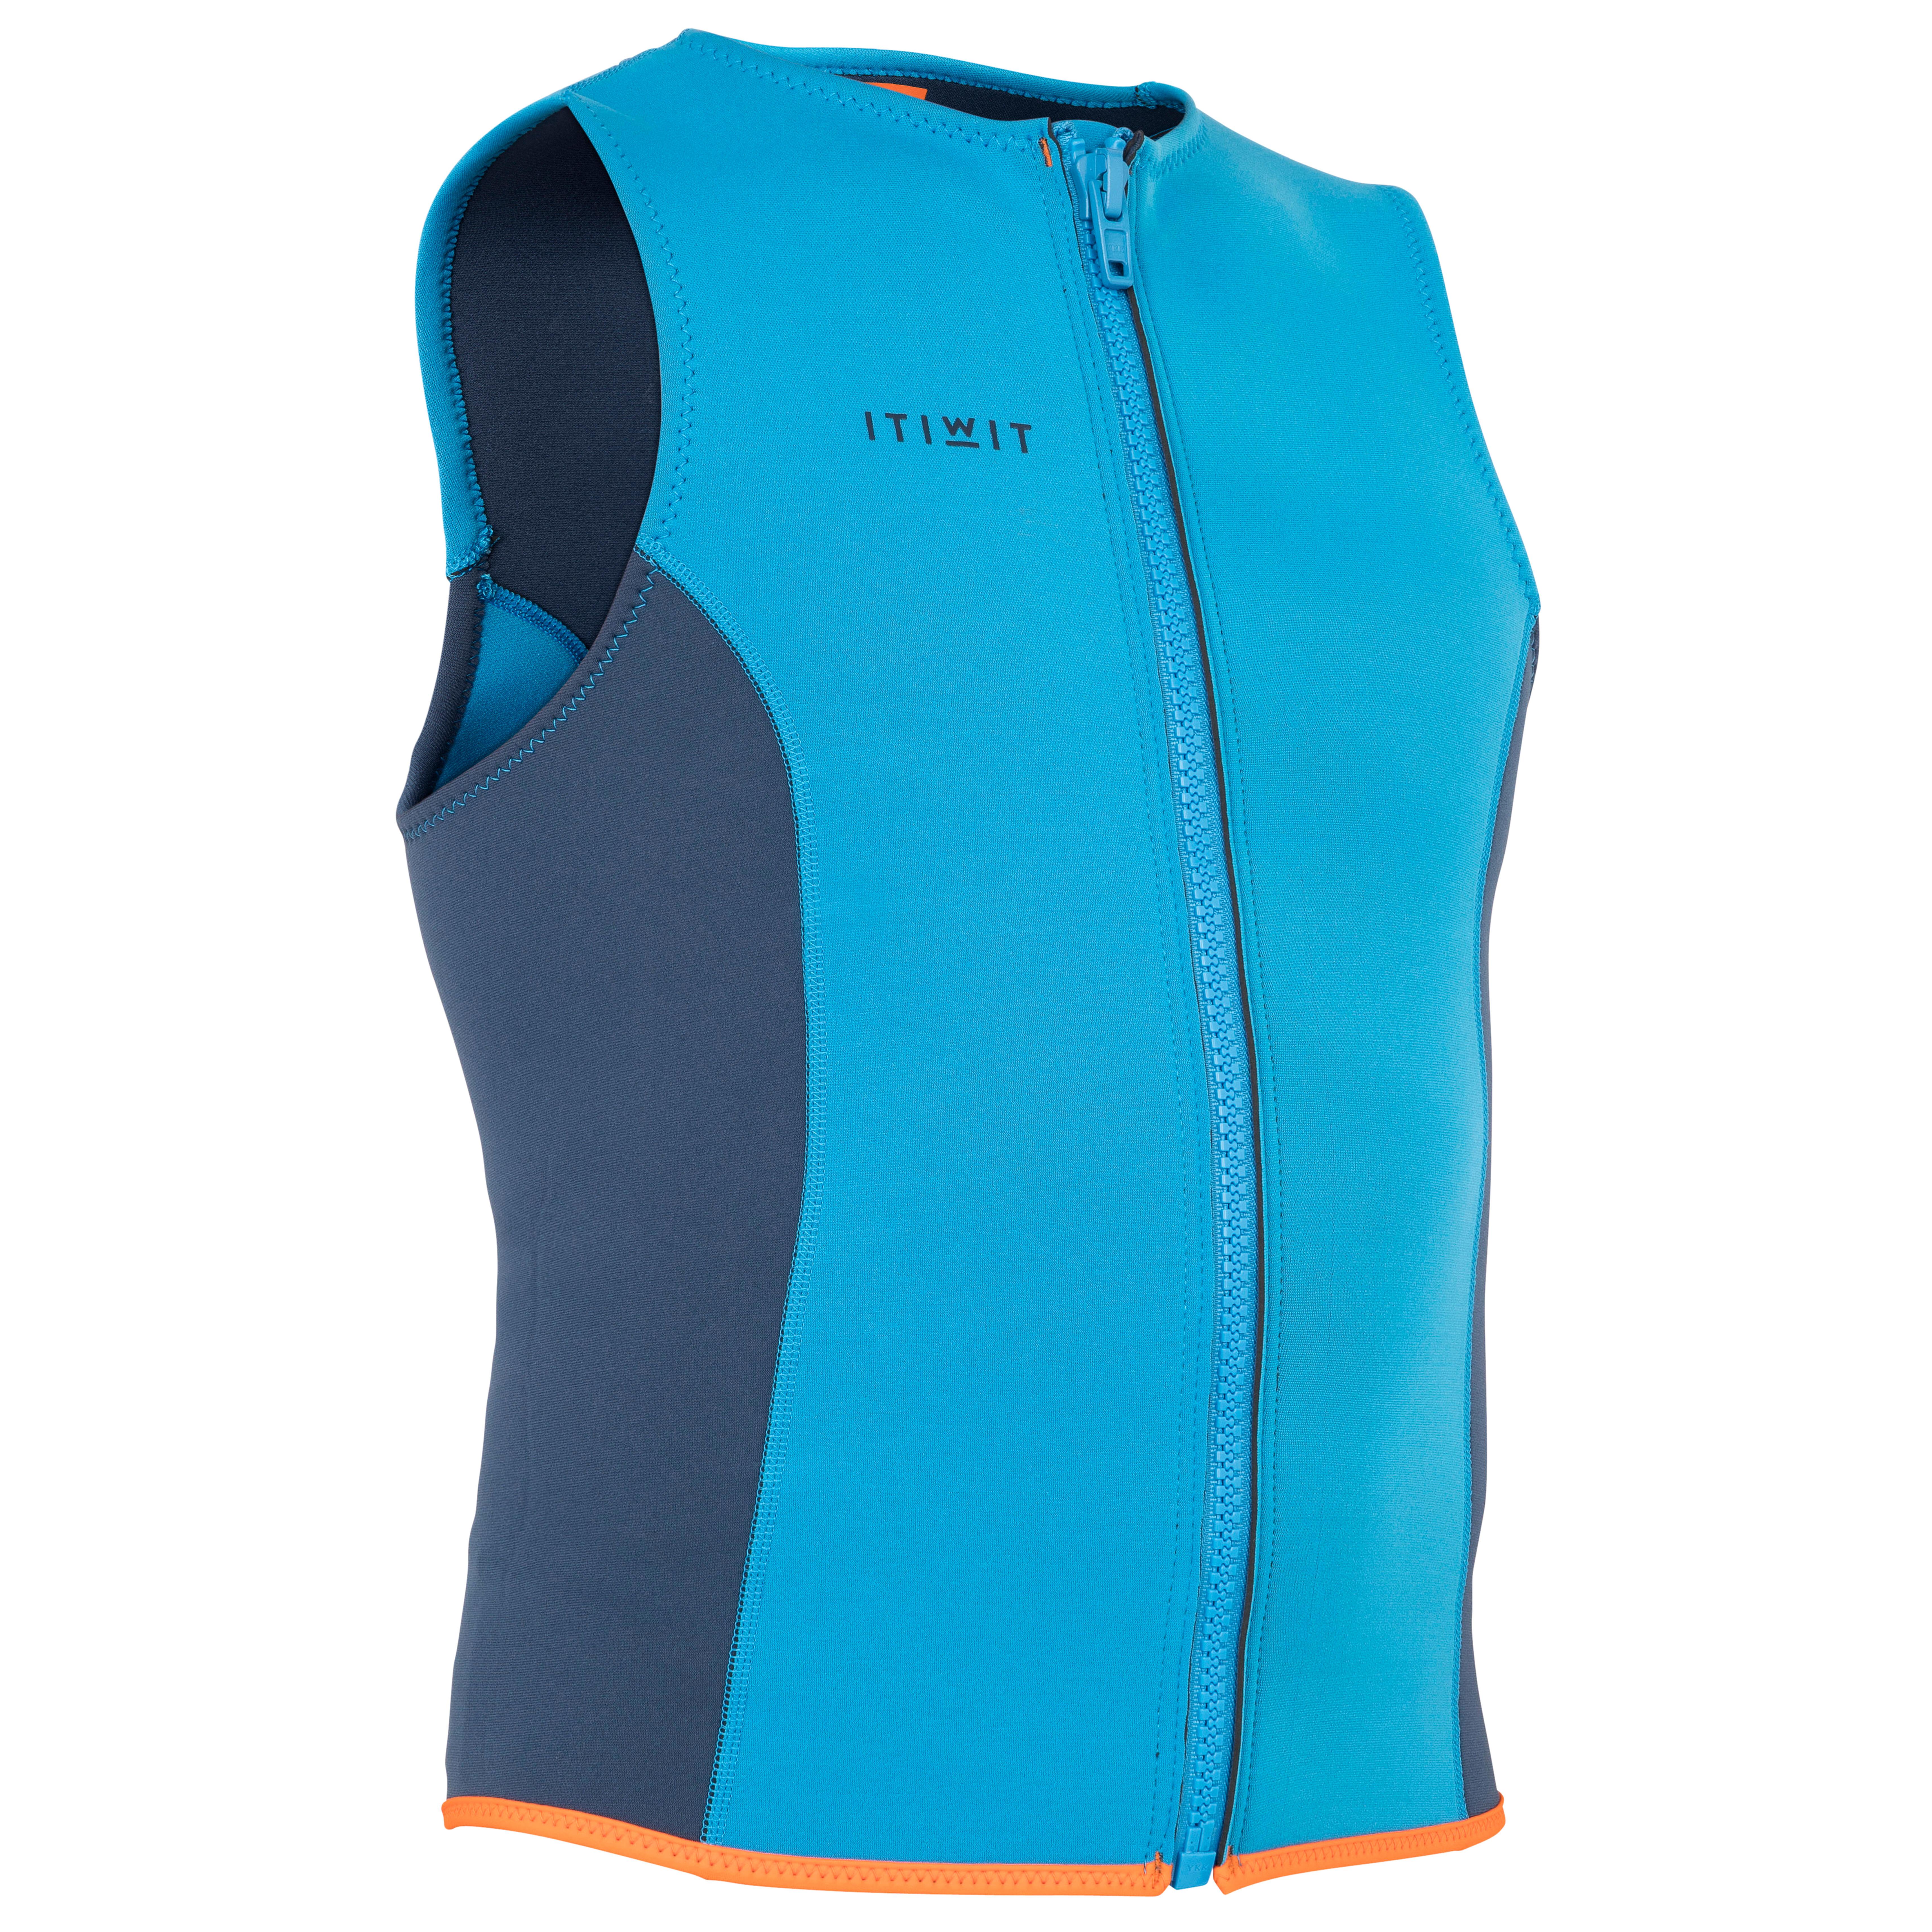 Nepreen vest / wetsuit vest kajakken / sup 500 neopreen 2 mm blauw - itiwit